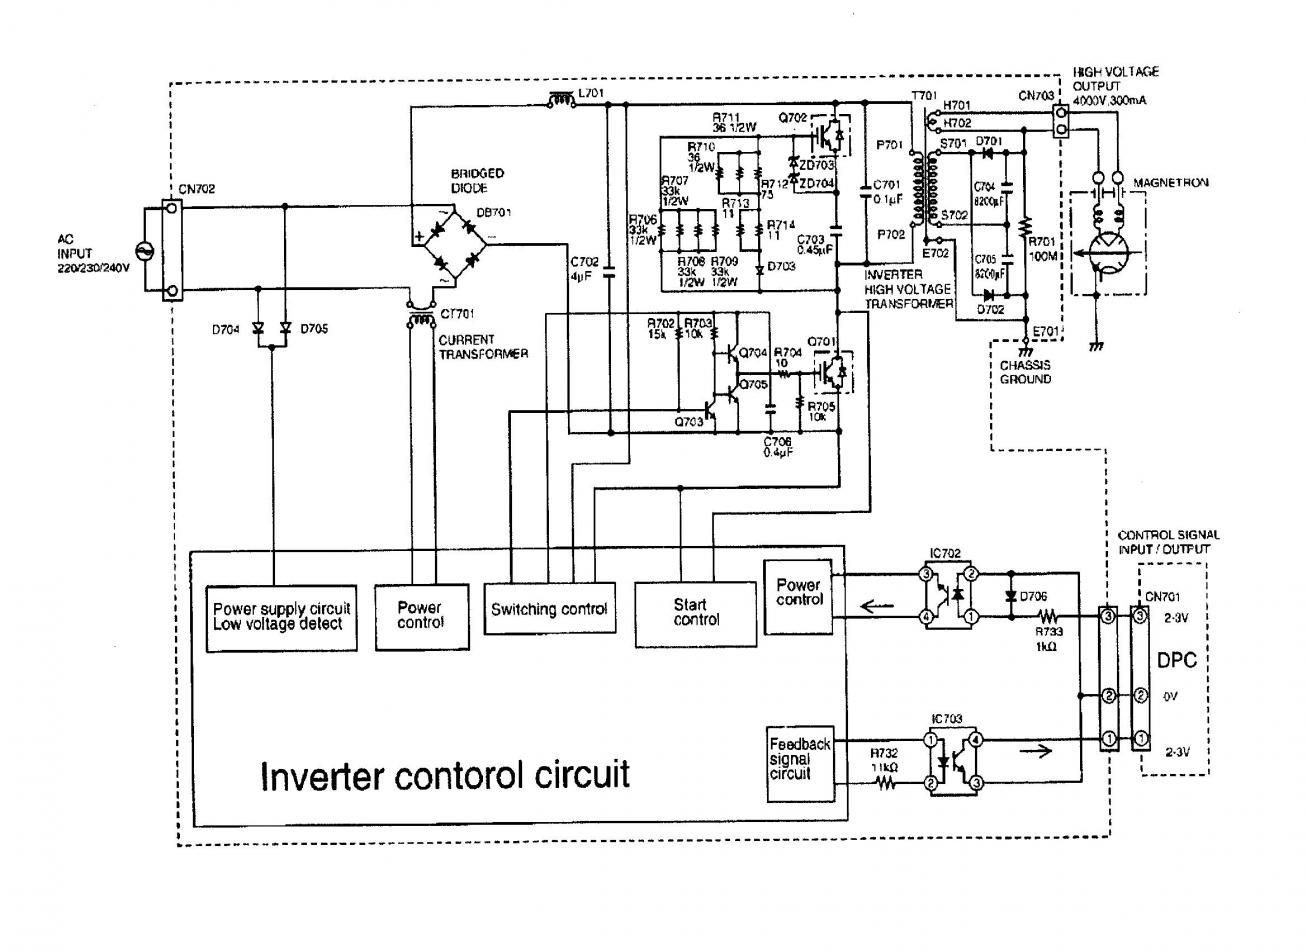 oven wiring diagram uk memphis audio diagrams microwave schematic j